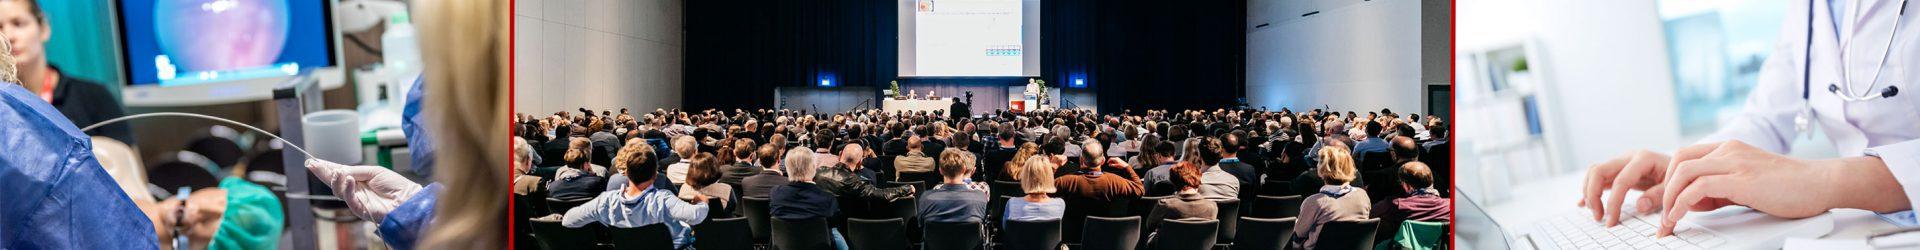 Viszeralmedizin NRW 2018